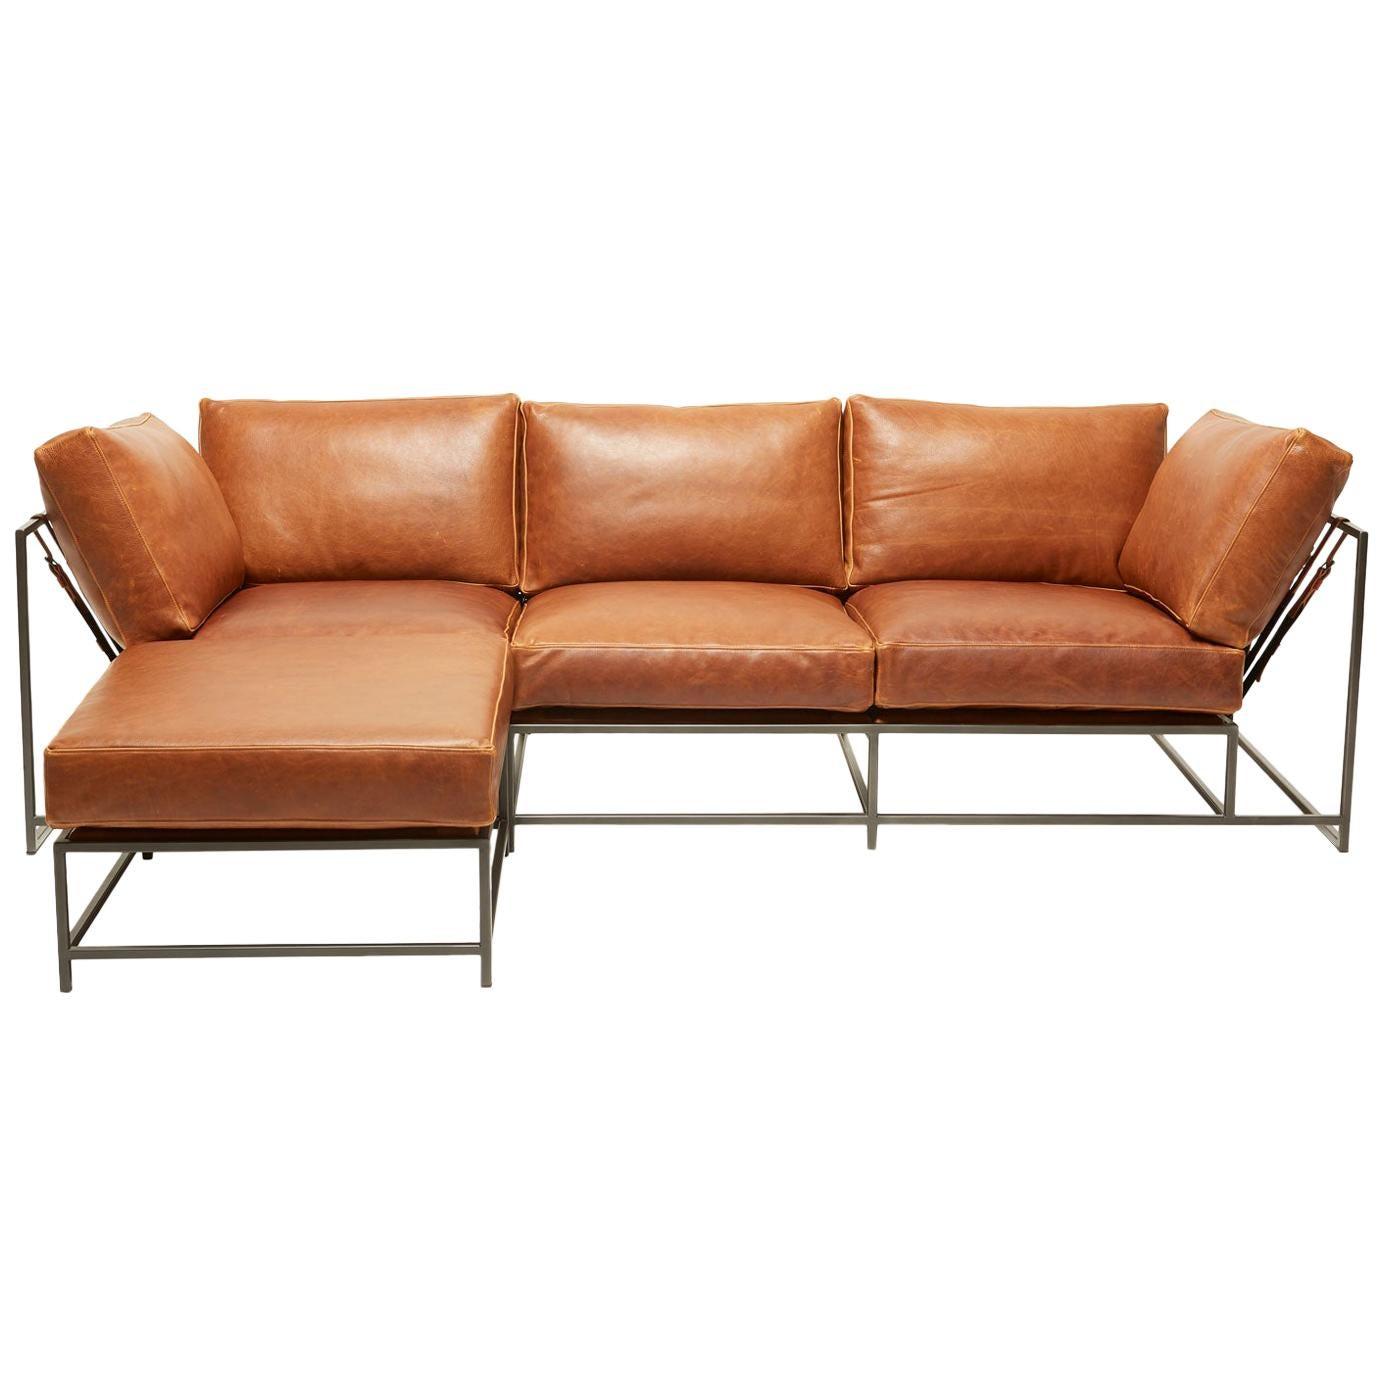 Potomac Tan Leather and Blackened Steel Sofa with Ottoman